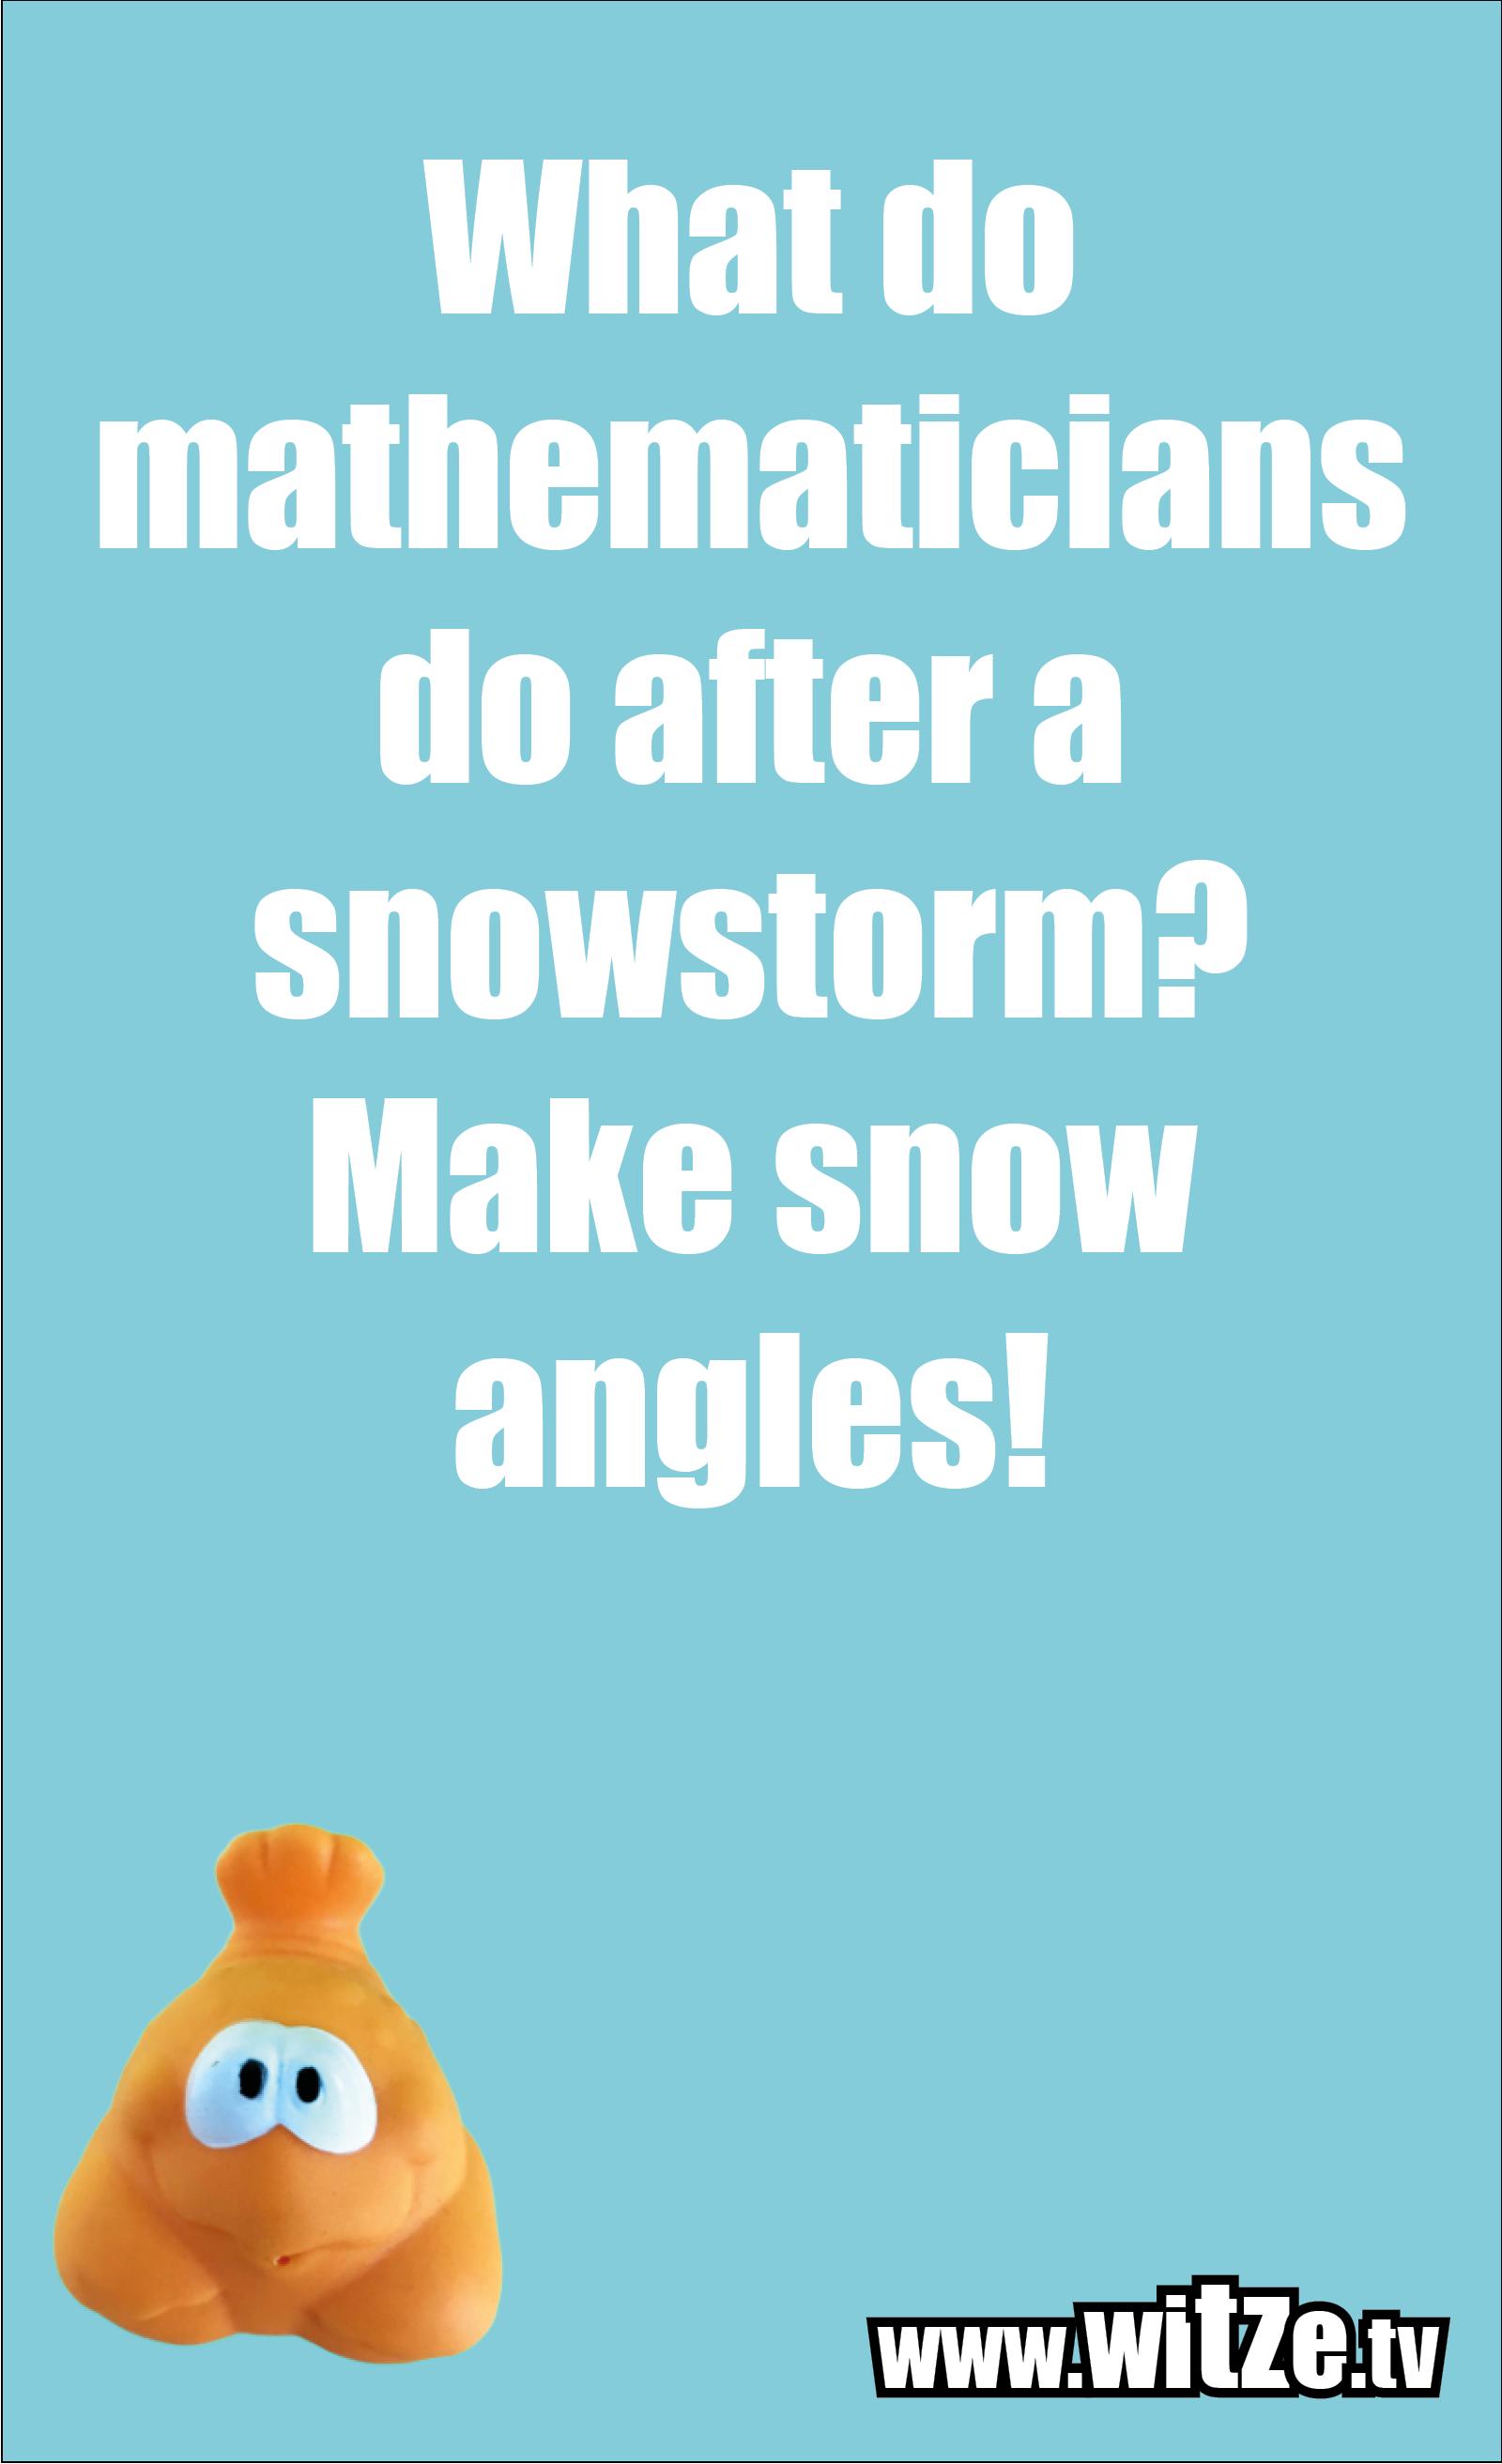 Math joke… What do mathematicians do after a snowstorm? Make snow angles!